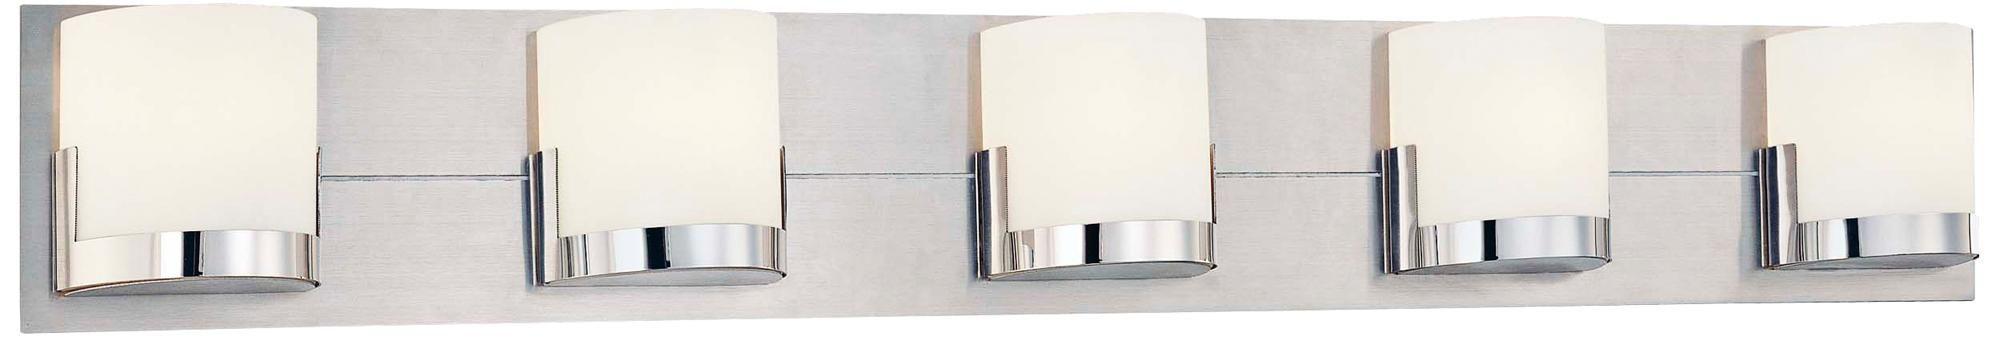 George Kovacs Convex 36 3 4 Wide Bathroom Wall Light P6977 Lamps Plus Vanity Lighting Bathroom Wall Lights Wall Lights